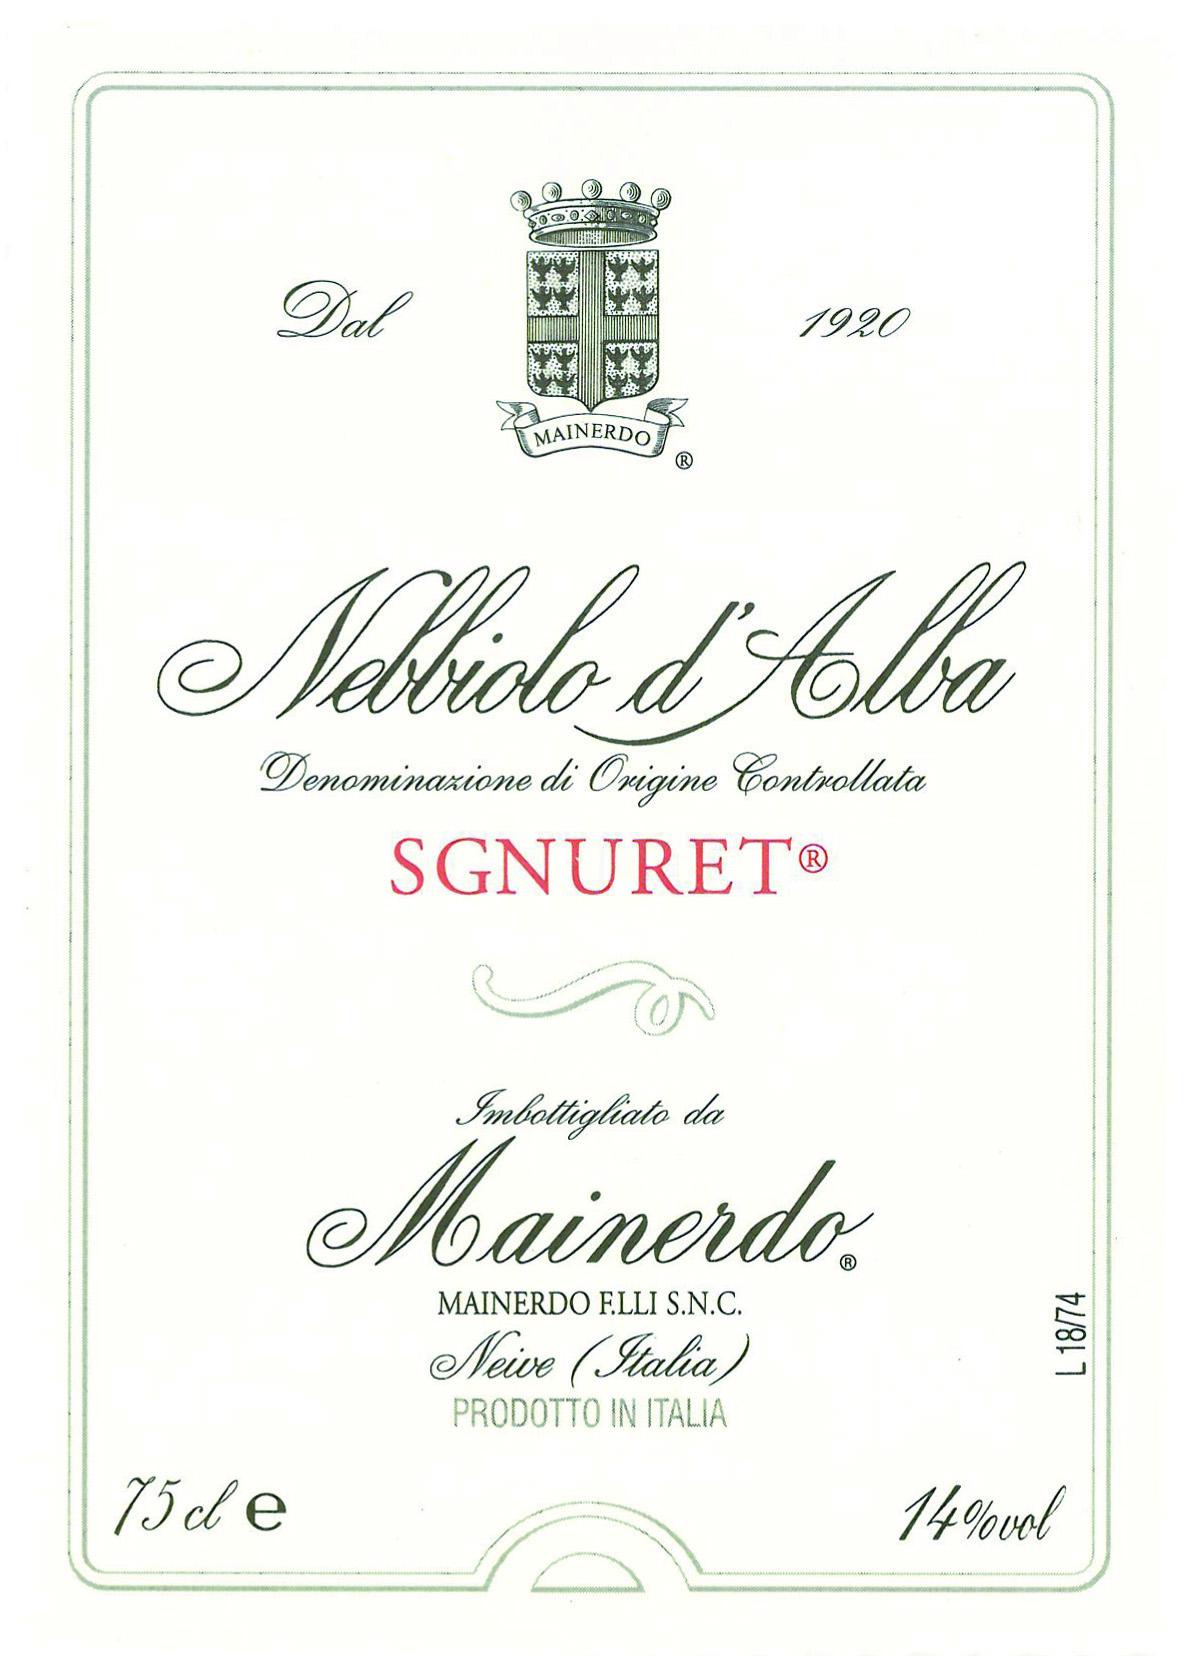 Nebbiolo d'Alba Sgnuret